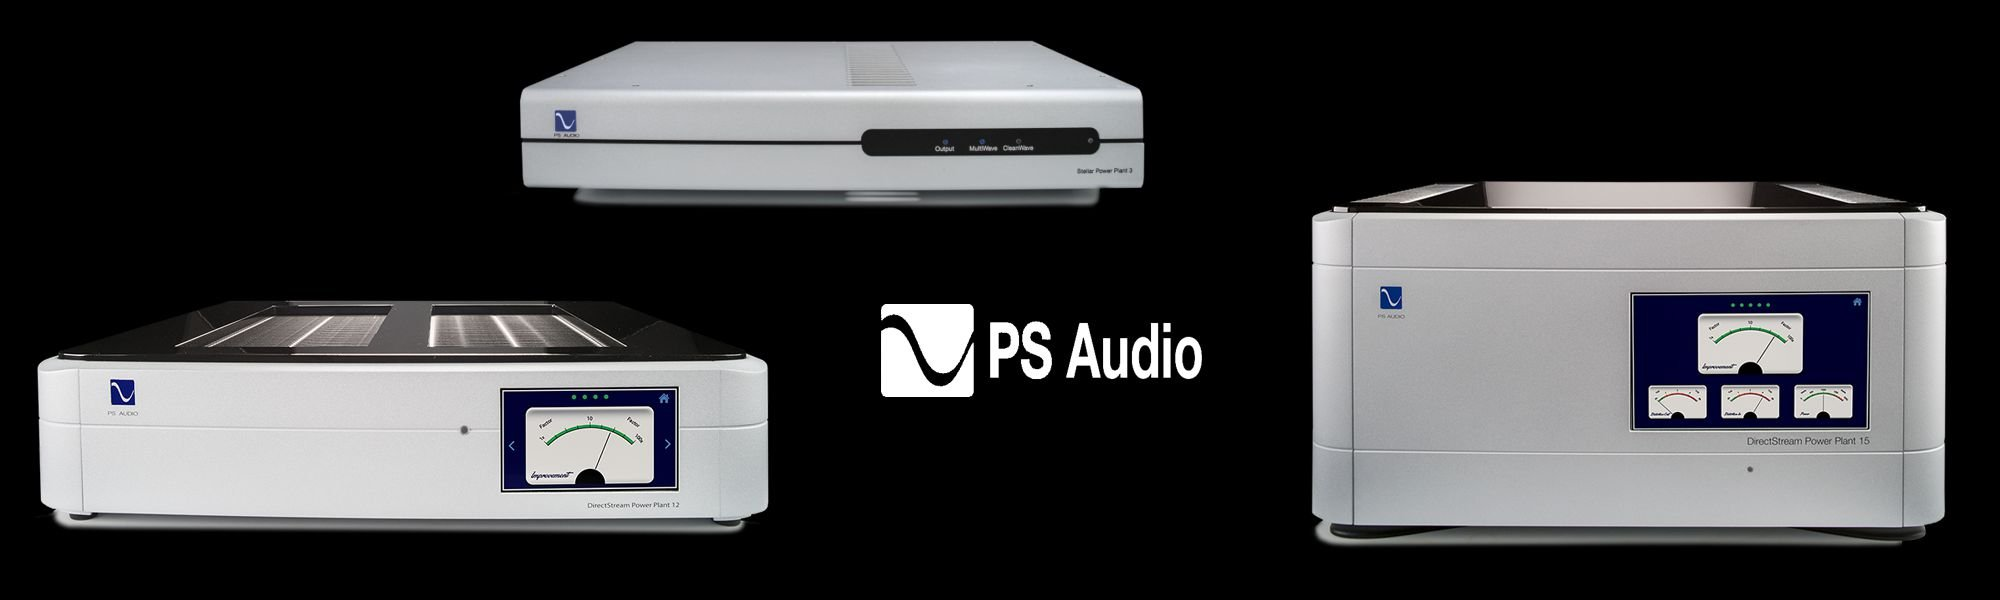 PS Audio  Power Plant Hifi Stromprodukte